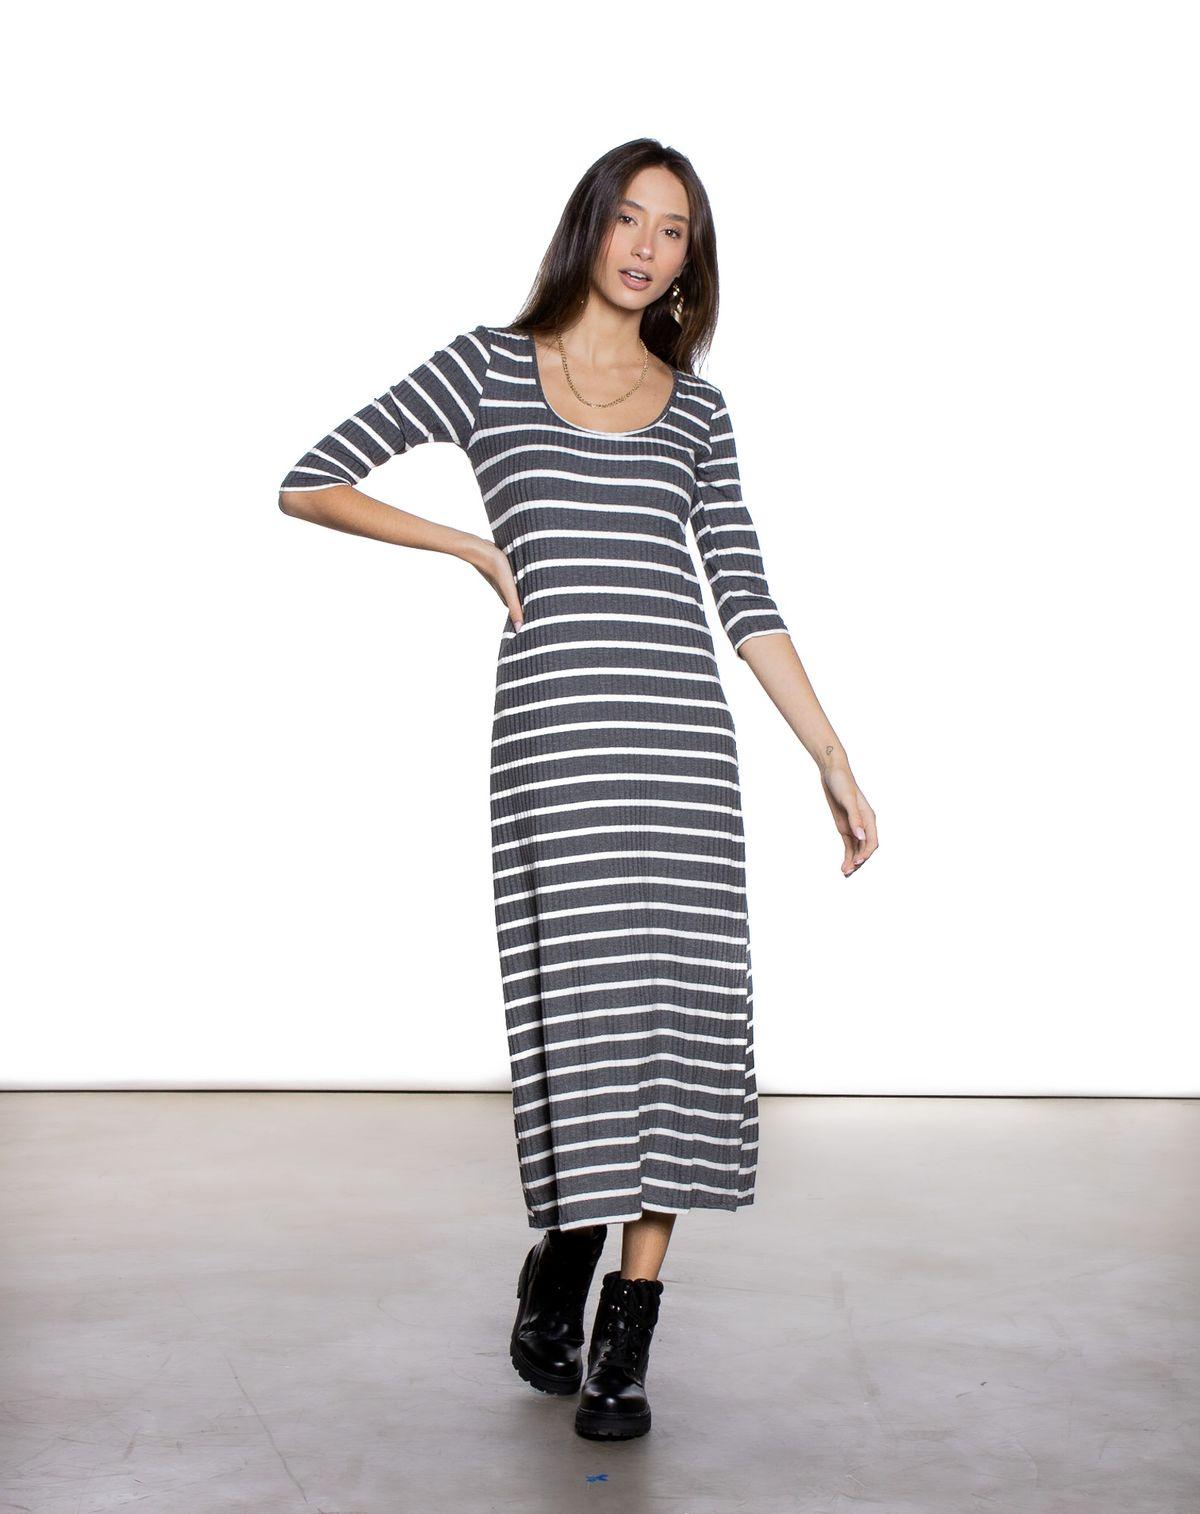 578113002-vestido-longo-manga-curta-feminino-canelado-estampa-listras-mescla-escuro-m-16e